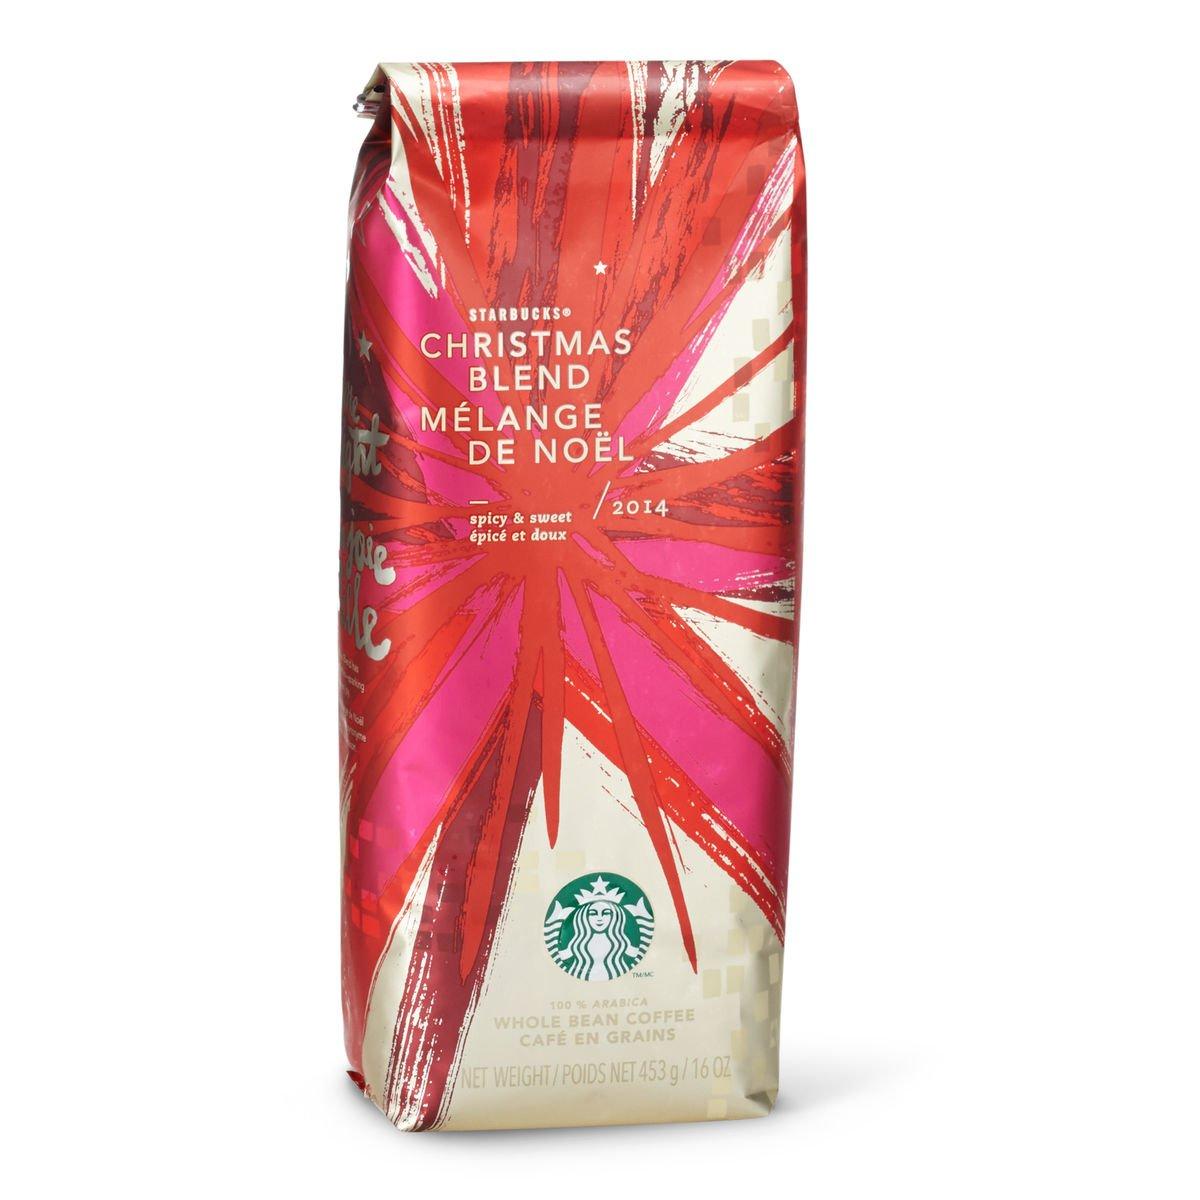 7b195124430 Amazon.com : 2014 Starbucks Christmas Blend Whole Bean Coffee - 1 Lb  (11002758) : Grocery & Gourmet Food